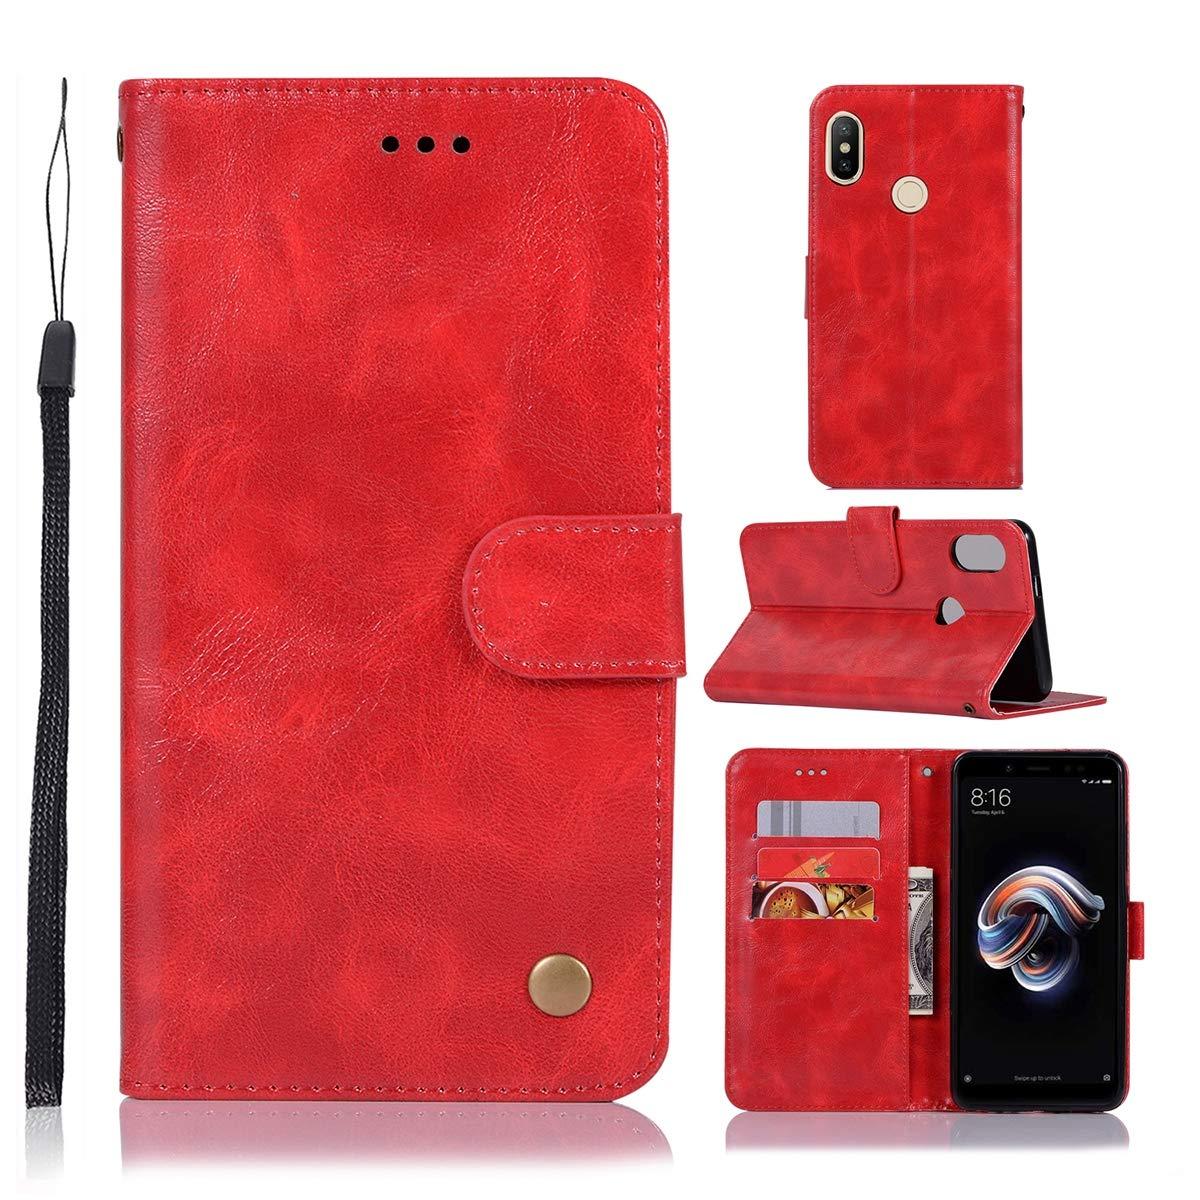 MEIRISHUN Xiaomi Redmi Note 6 Pro Case, [Vintage Lines] [High-end Series] PU Leather Wallet Flip Cover Folio Case Cover Xiaomi Redmi Note 6 Pro - Gray